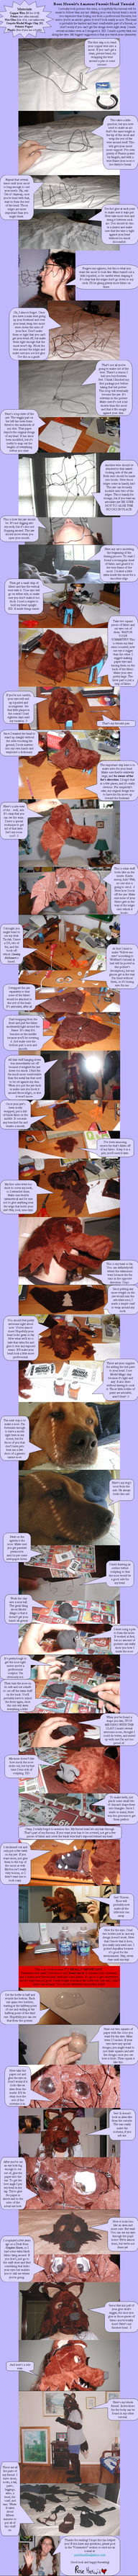 Fursuit Head Tutorial by RoseHexwit